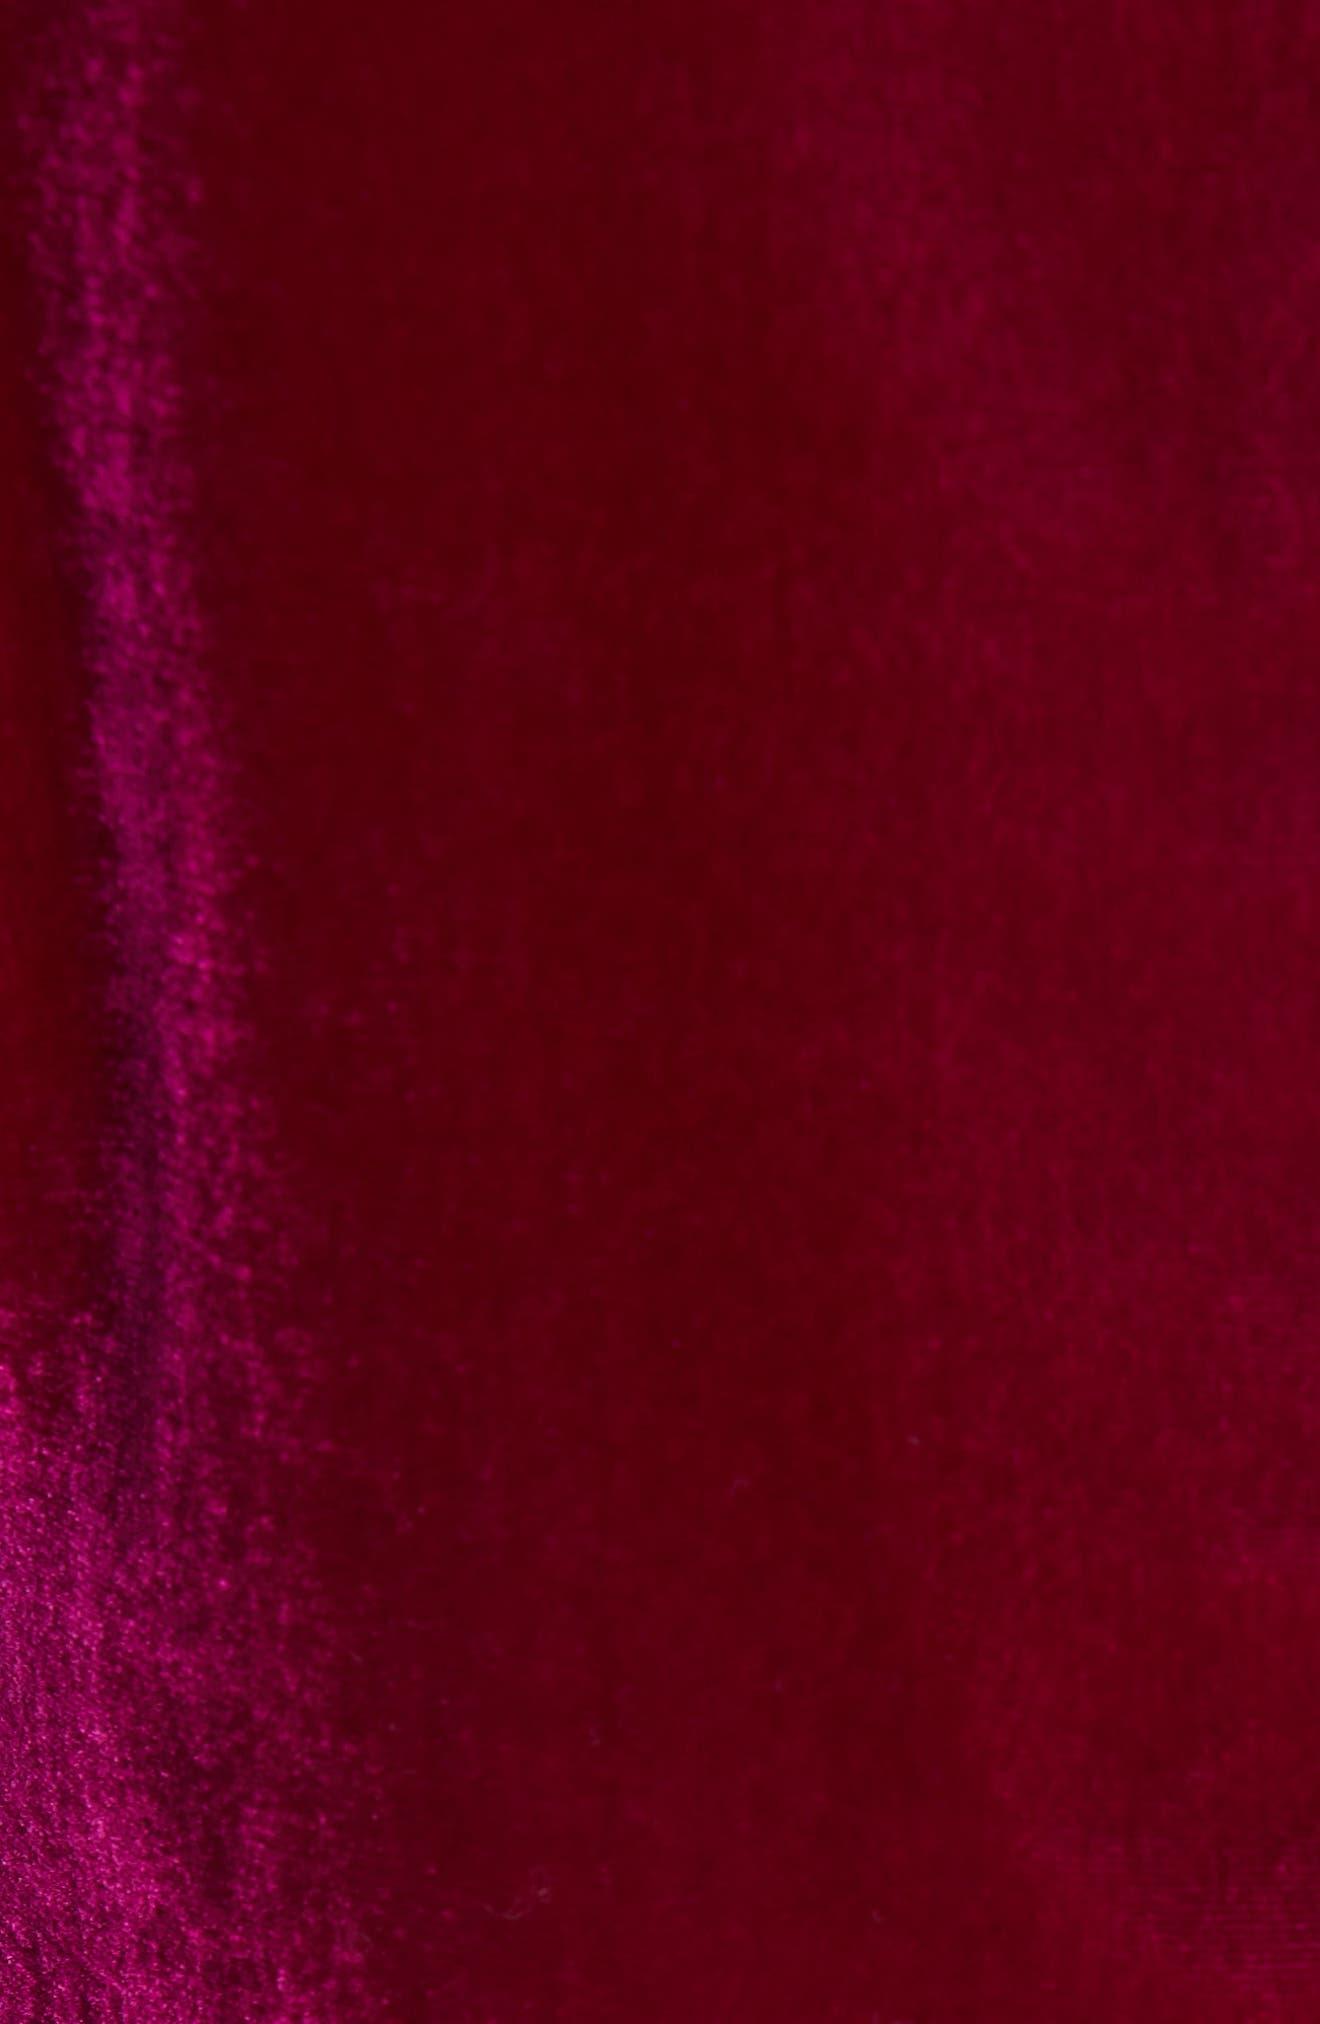 Ruched Sleeve Velvet Top,                             Alternate thumbnail 5, color,                             CRANBERRY